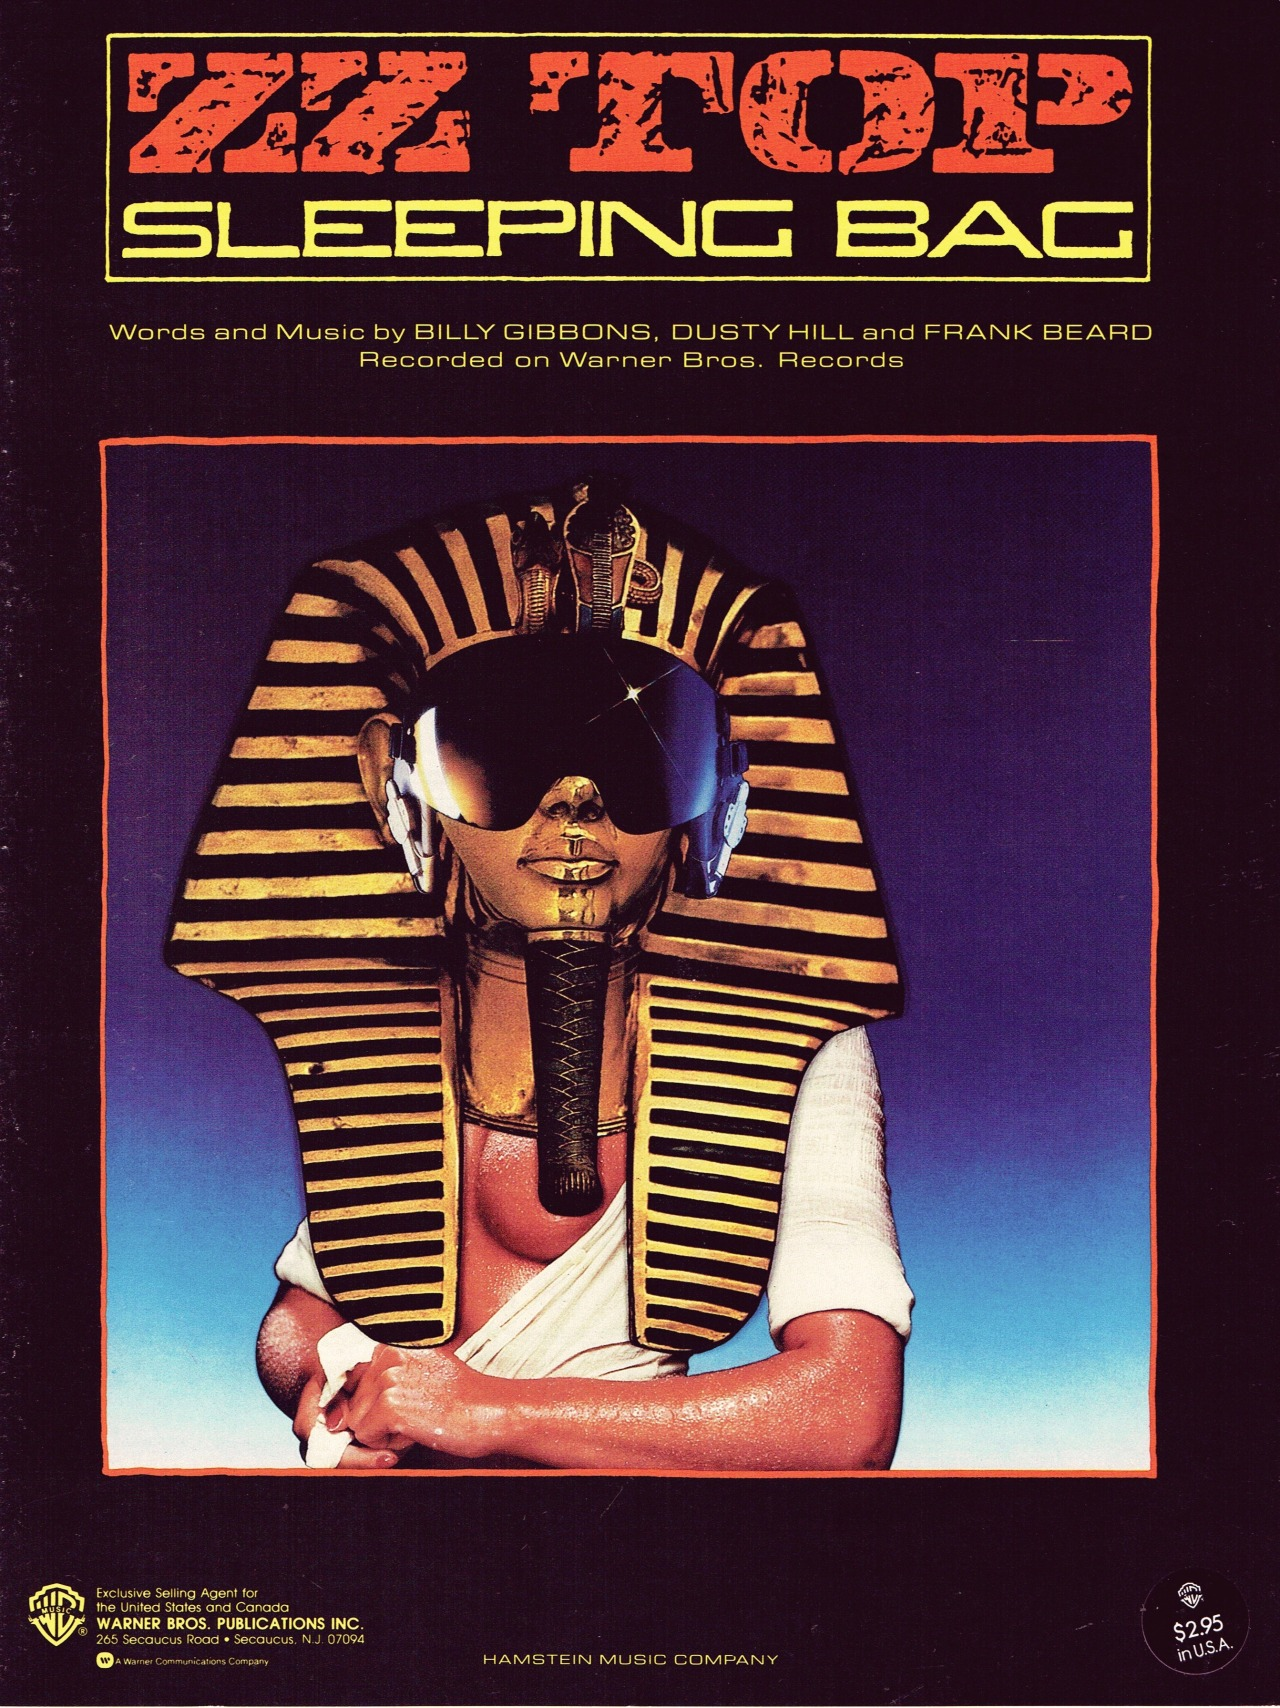 Sleeping Bag / ZZ Top (1985) #sheet music#sheetmusic#1980s music#music